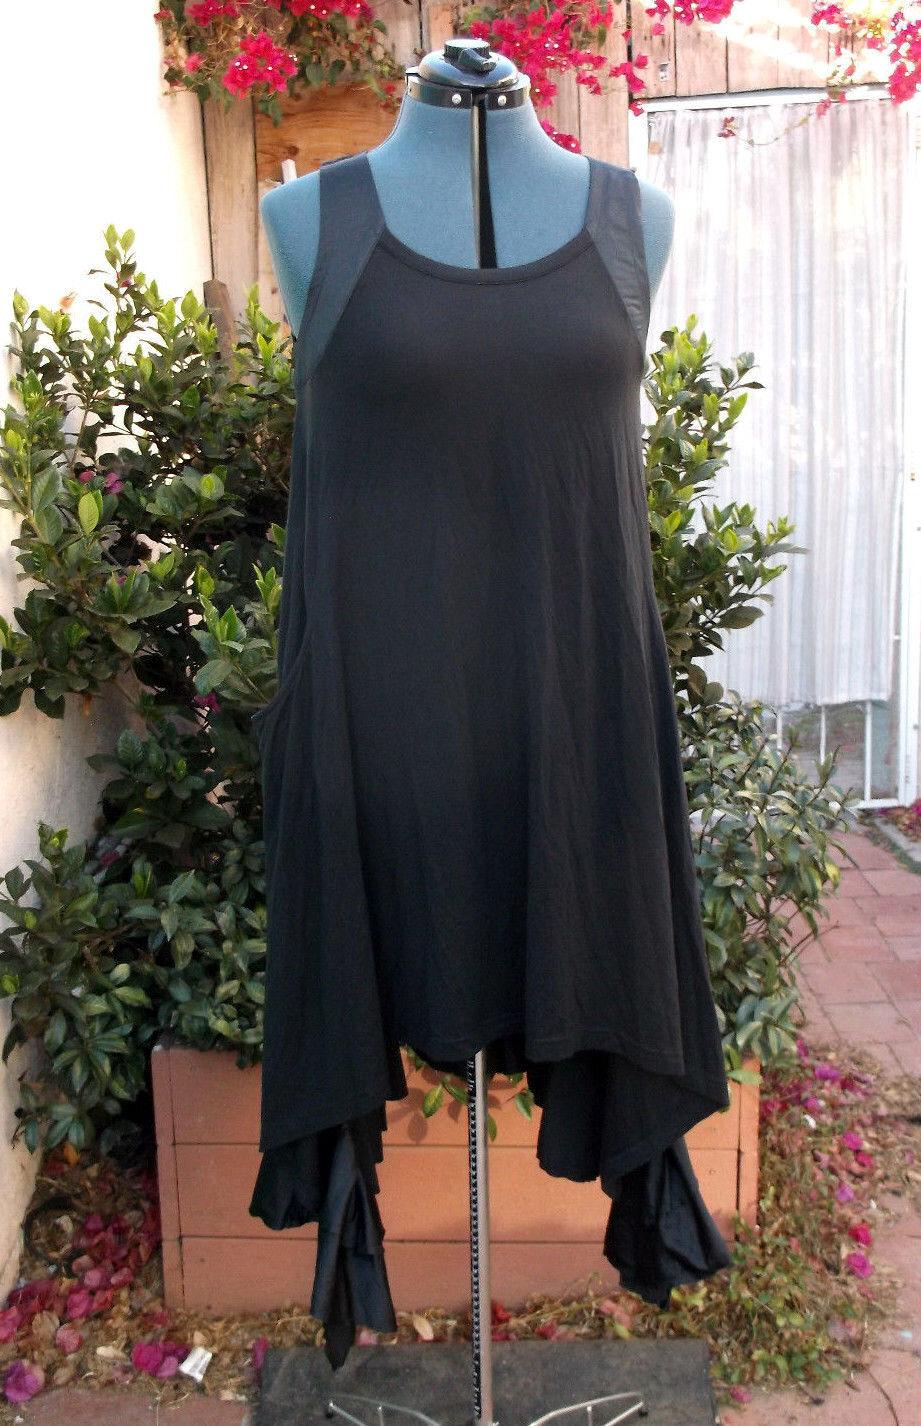 Yohji Yamamoto Y-3 harness dress deconstructed ruffled bubbled hem NWT rtl